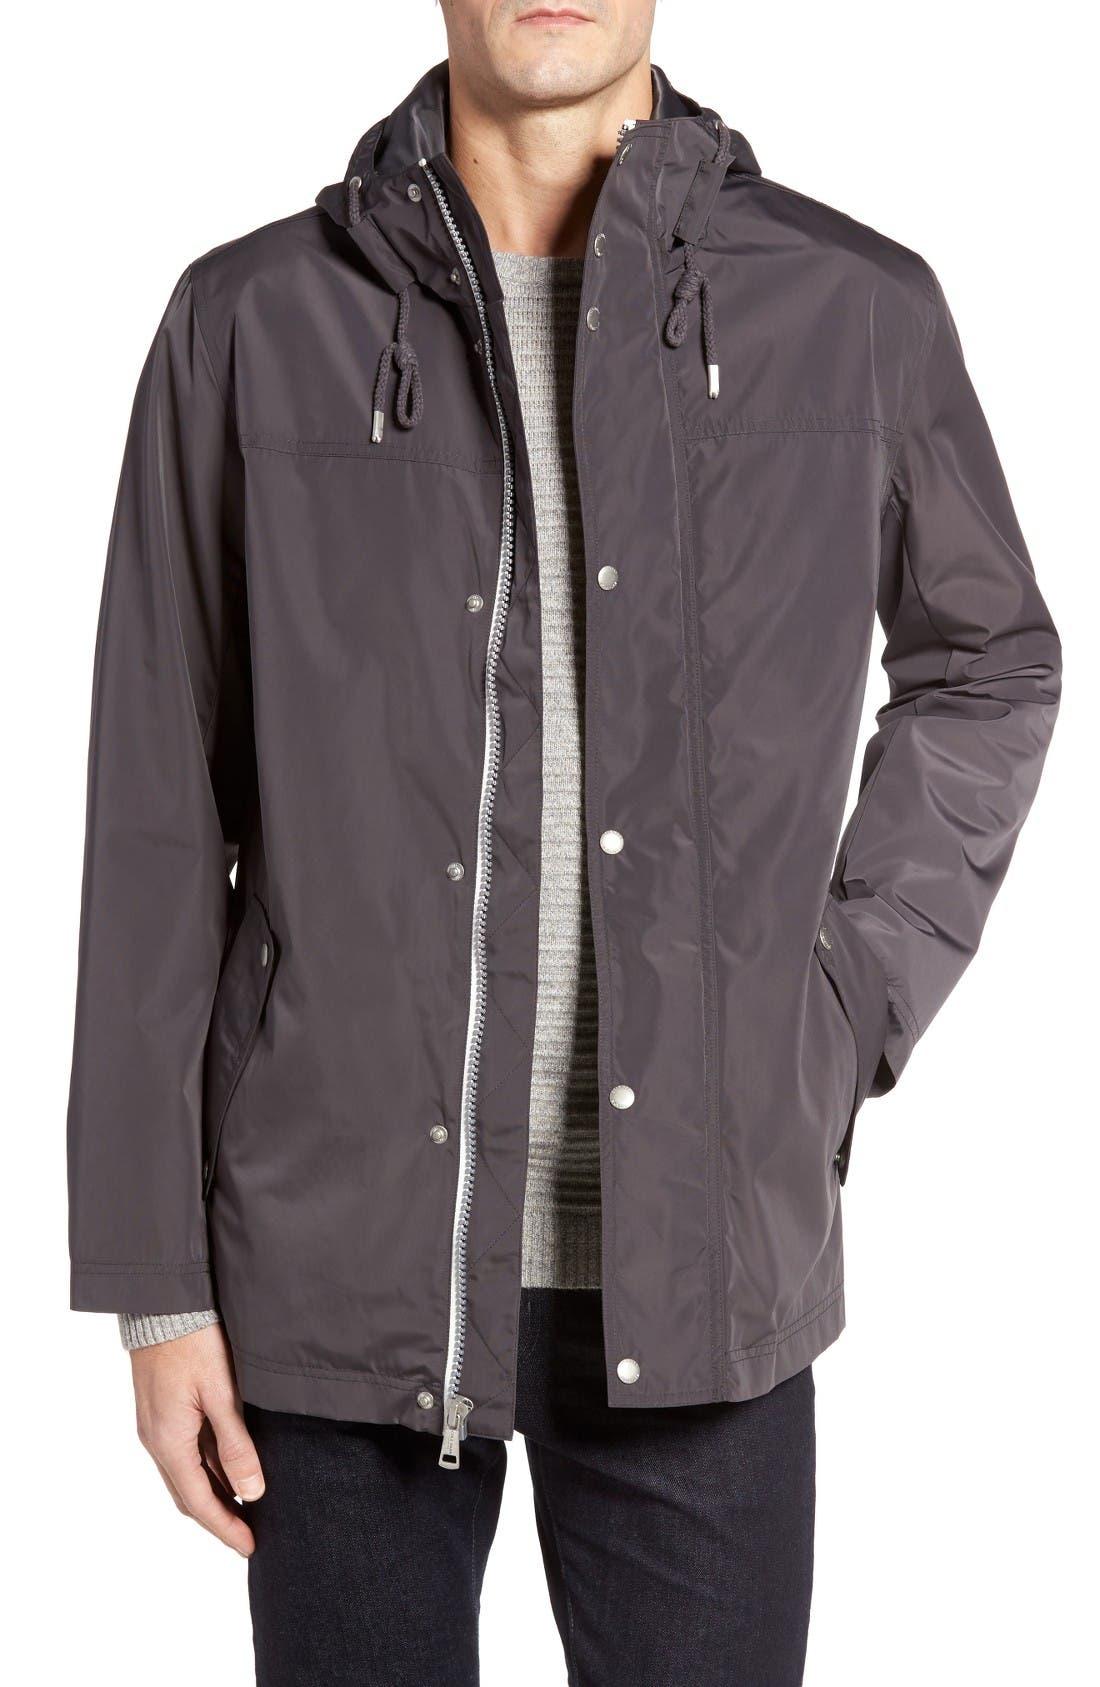 Main Image - Cole Haan Packable Hooded Rain Jacket